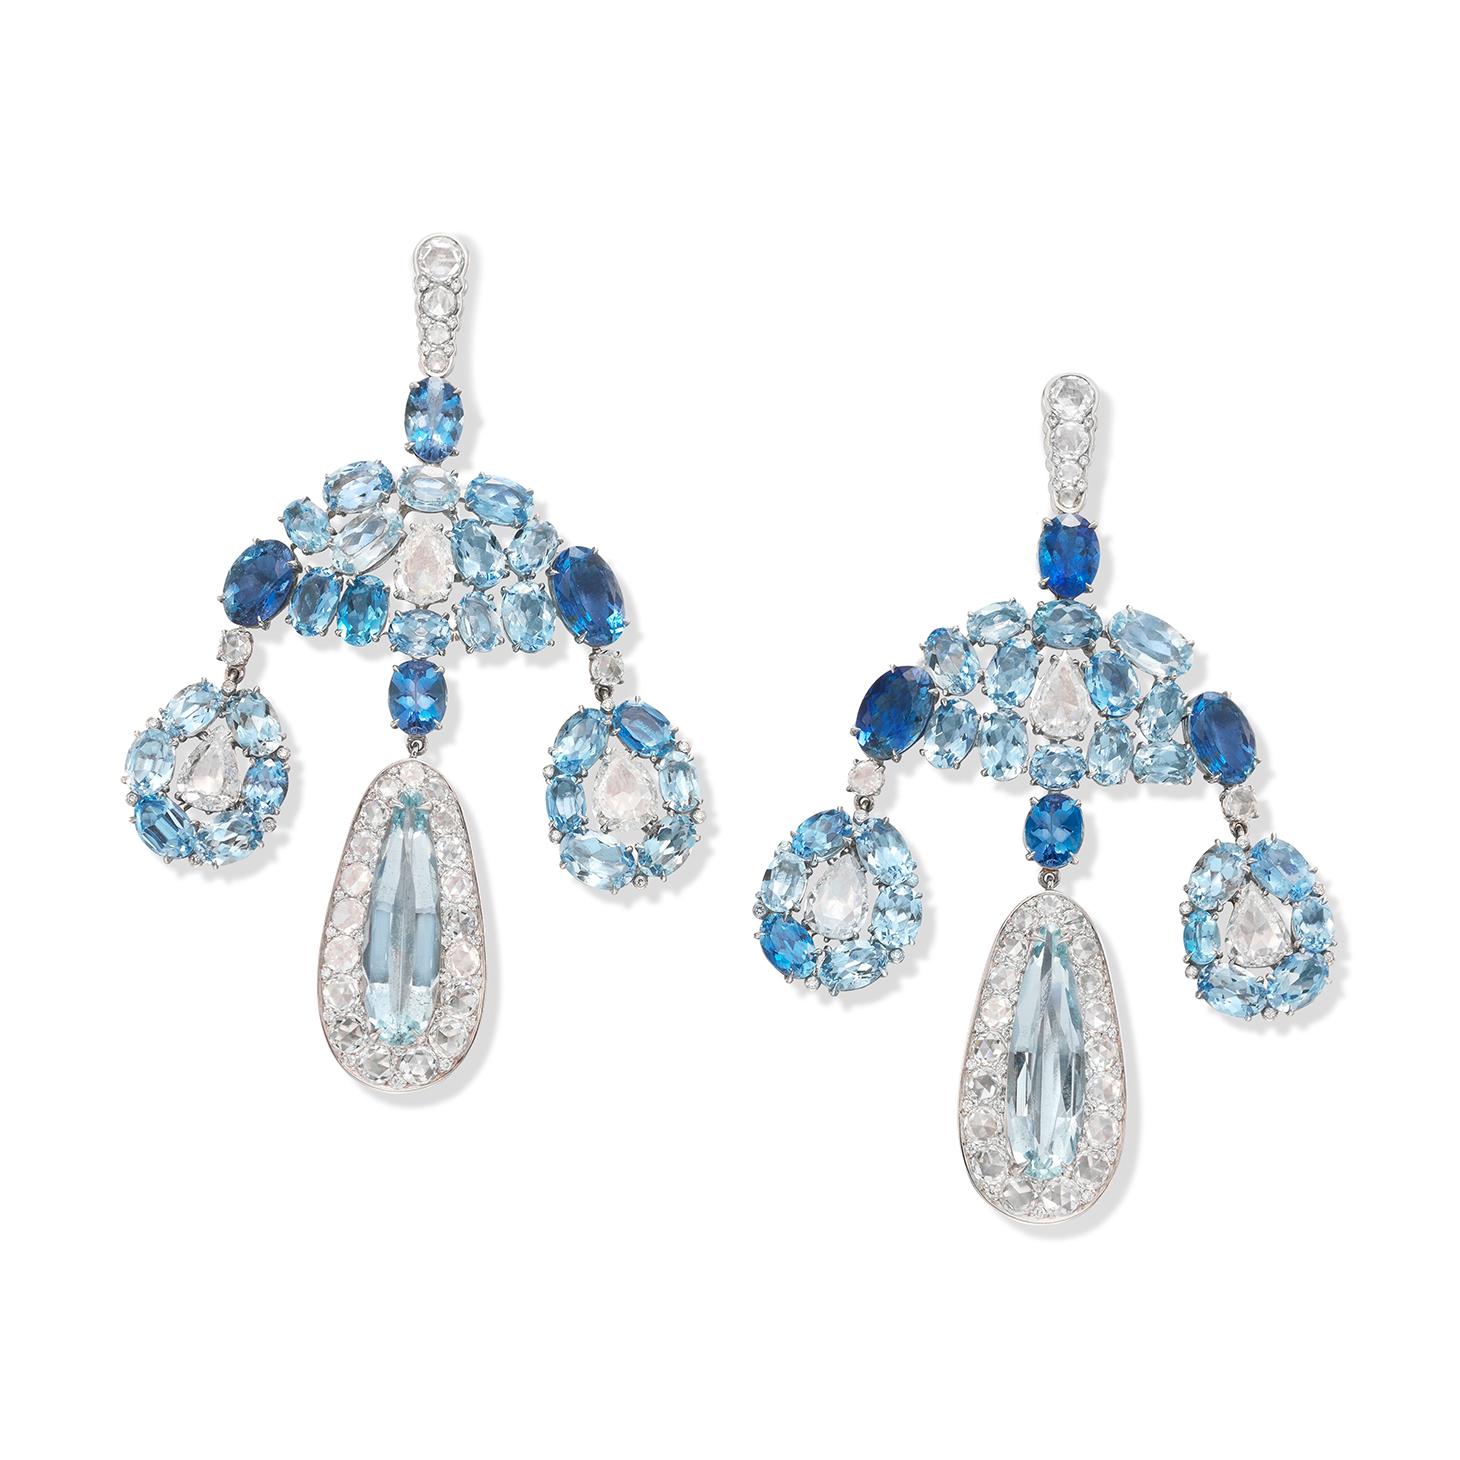 A Pair of Aquamarine and Diamond Girandole Ear Pendants, by SABBA